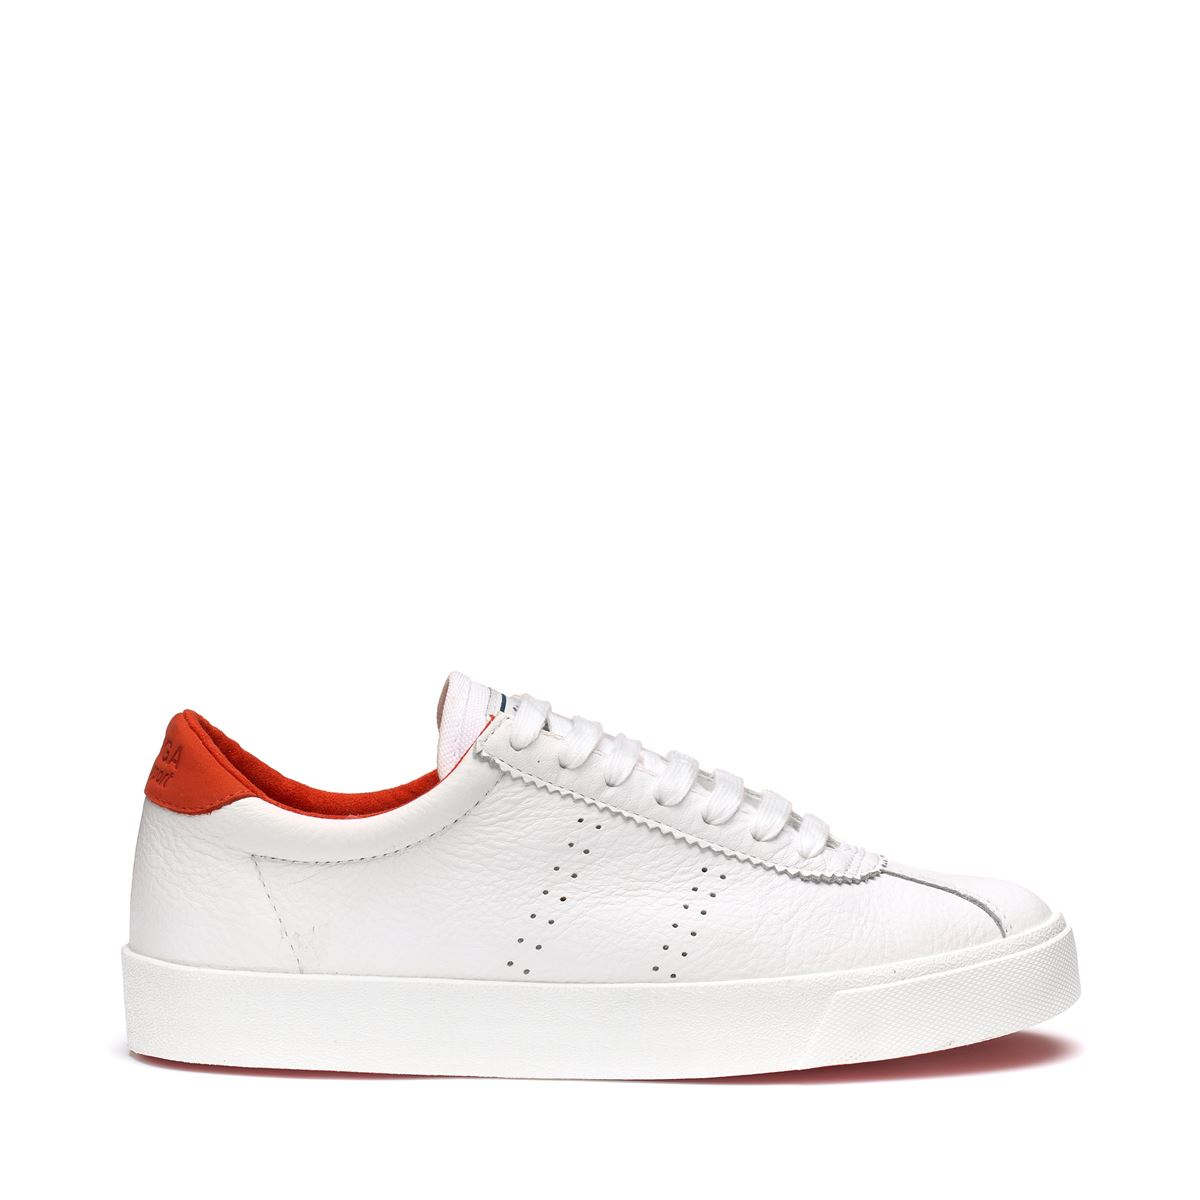 Superga Scarpe Sneakers 2843-COMFLEAU Uomo Donna Tennis sport Basso